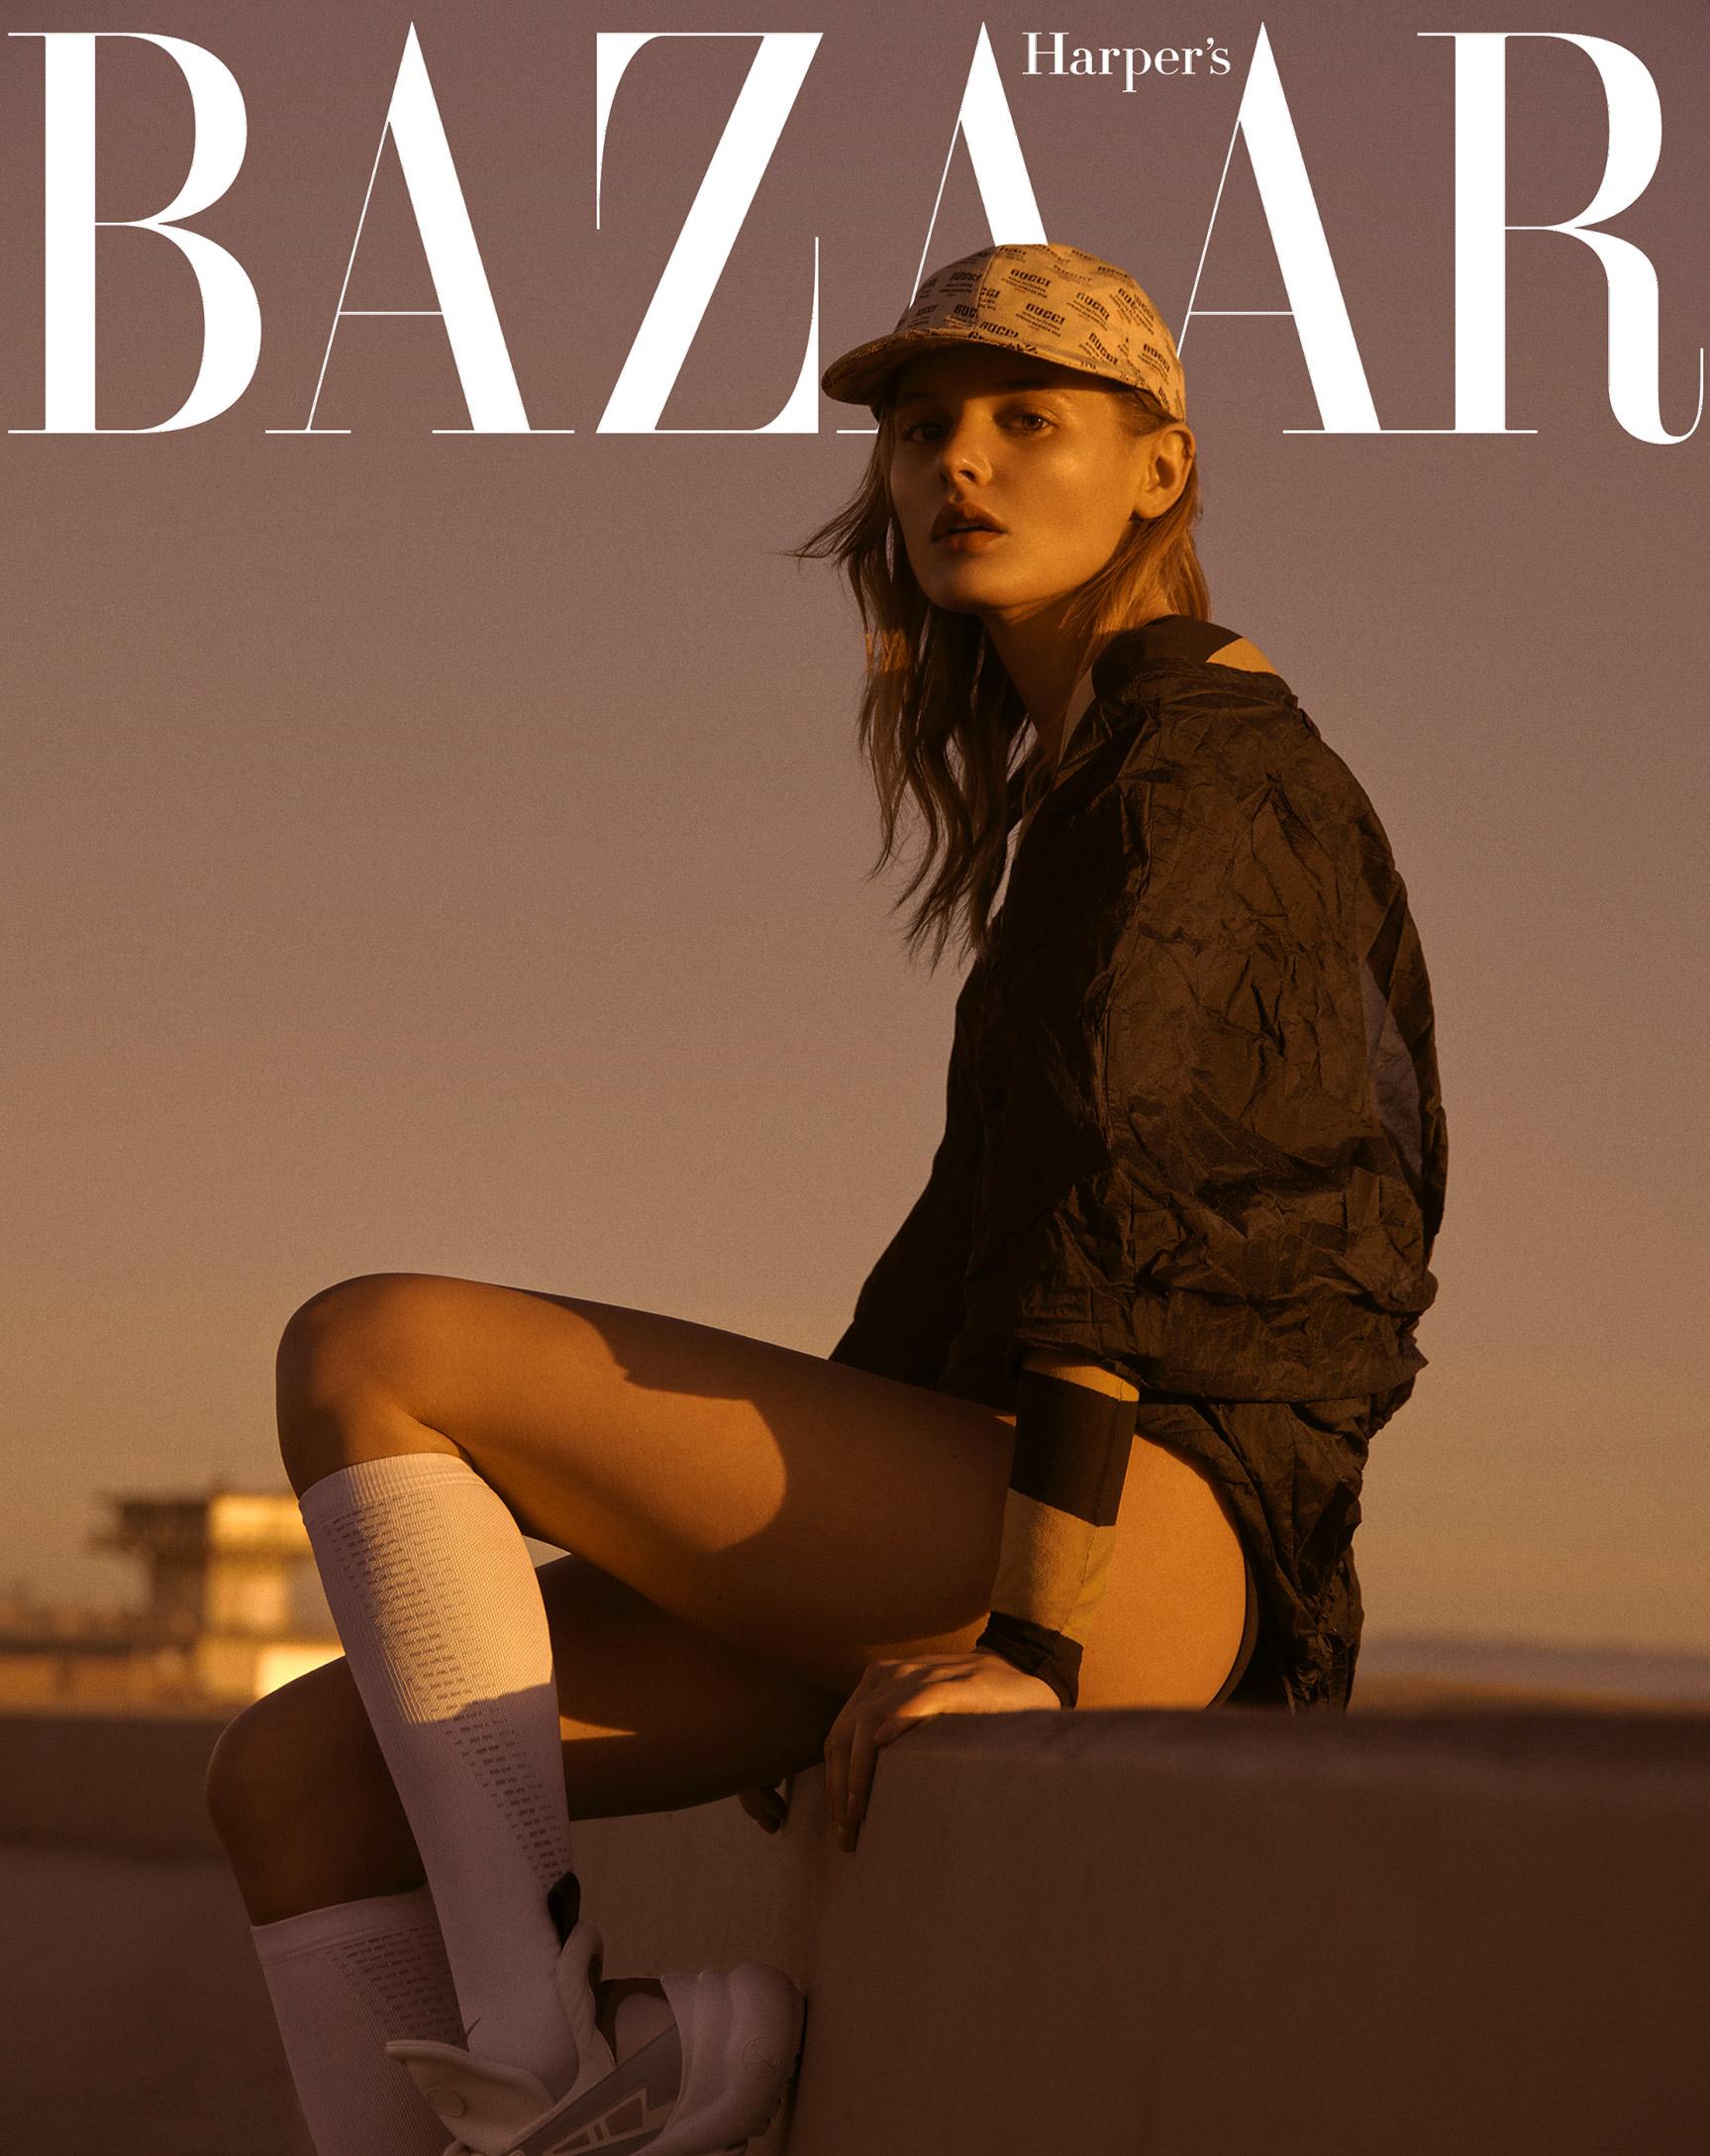 Пляжно-спортивная одежда Calzedonia / Paige Reifler By Andreas Ortner / Harpers Bazaar Czech august 2018